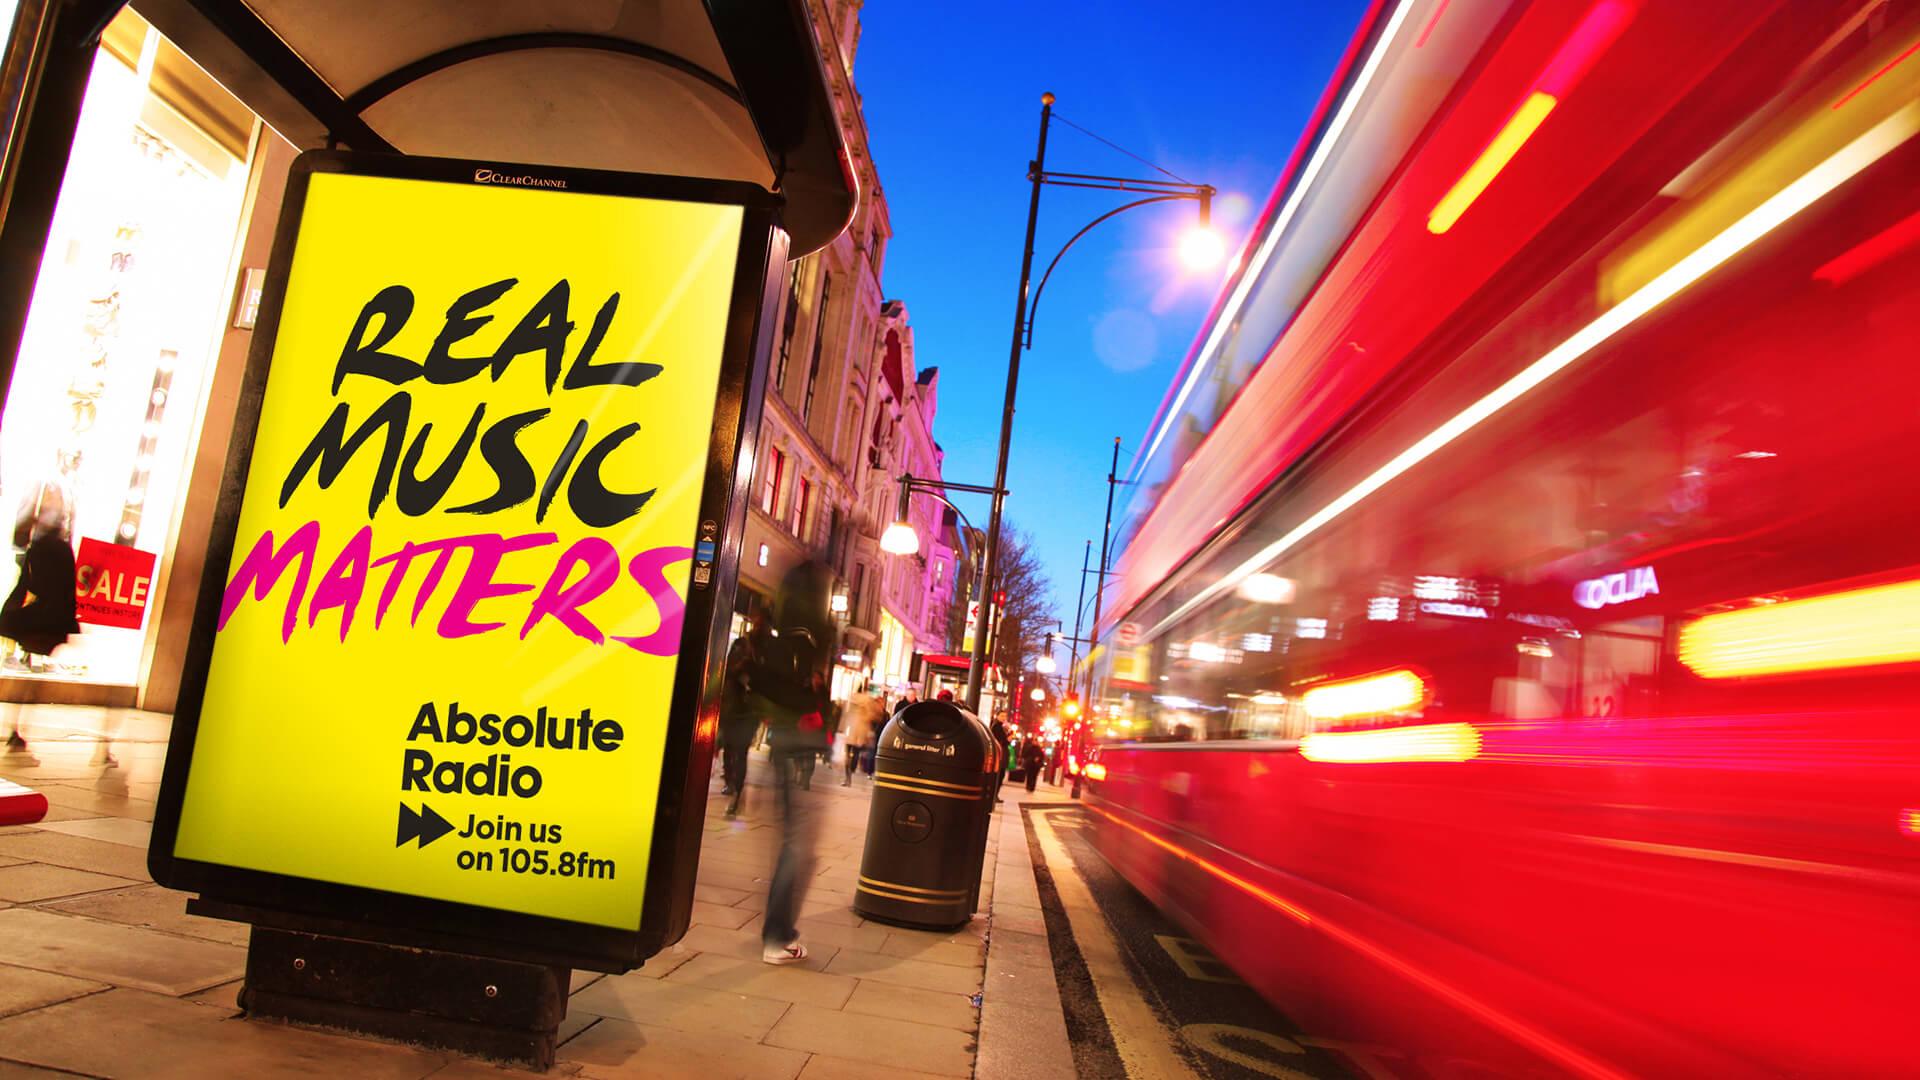 Absolute radio digital advertsiing programmatic advertising outdoor digital